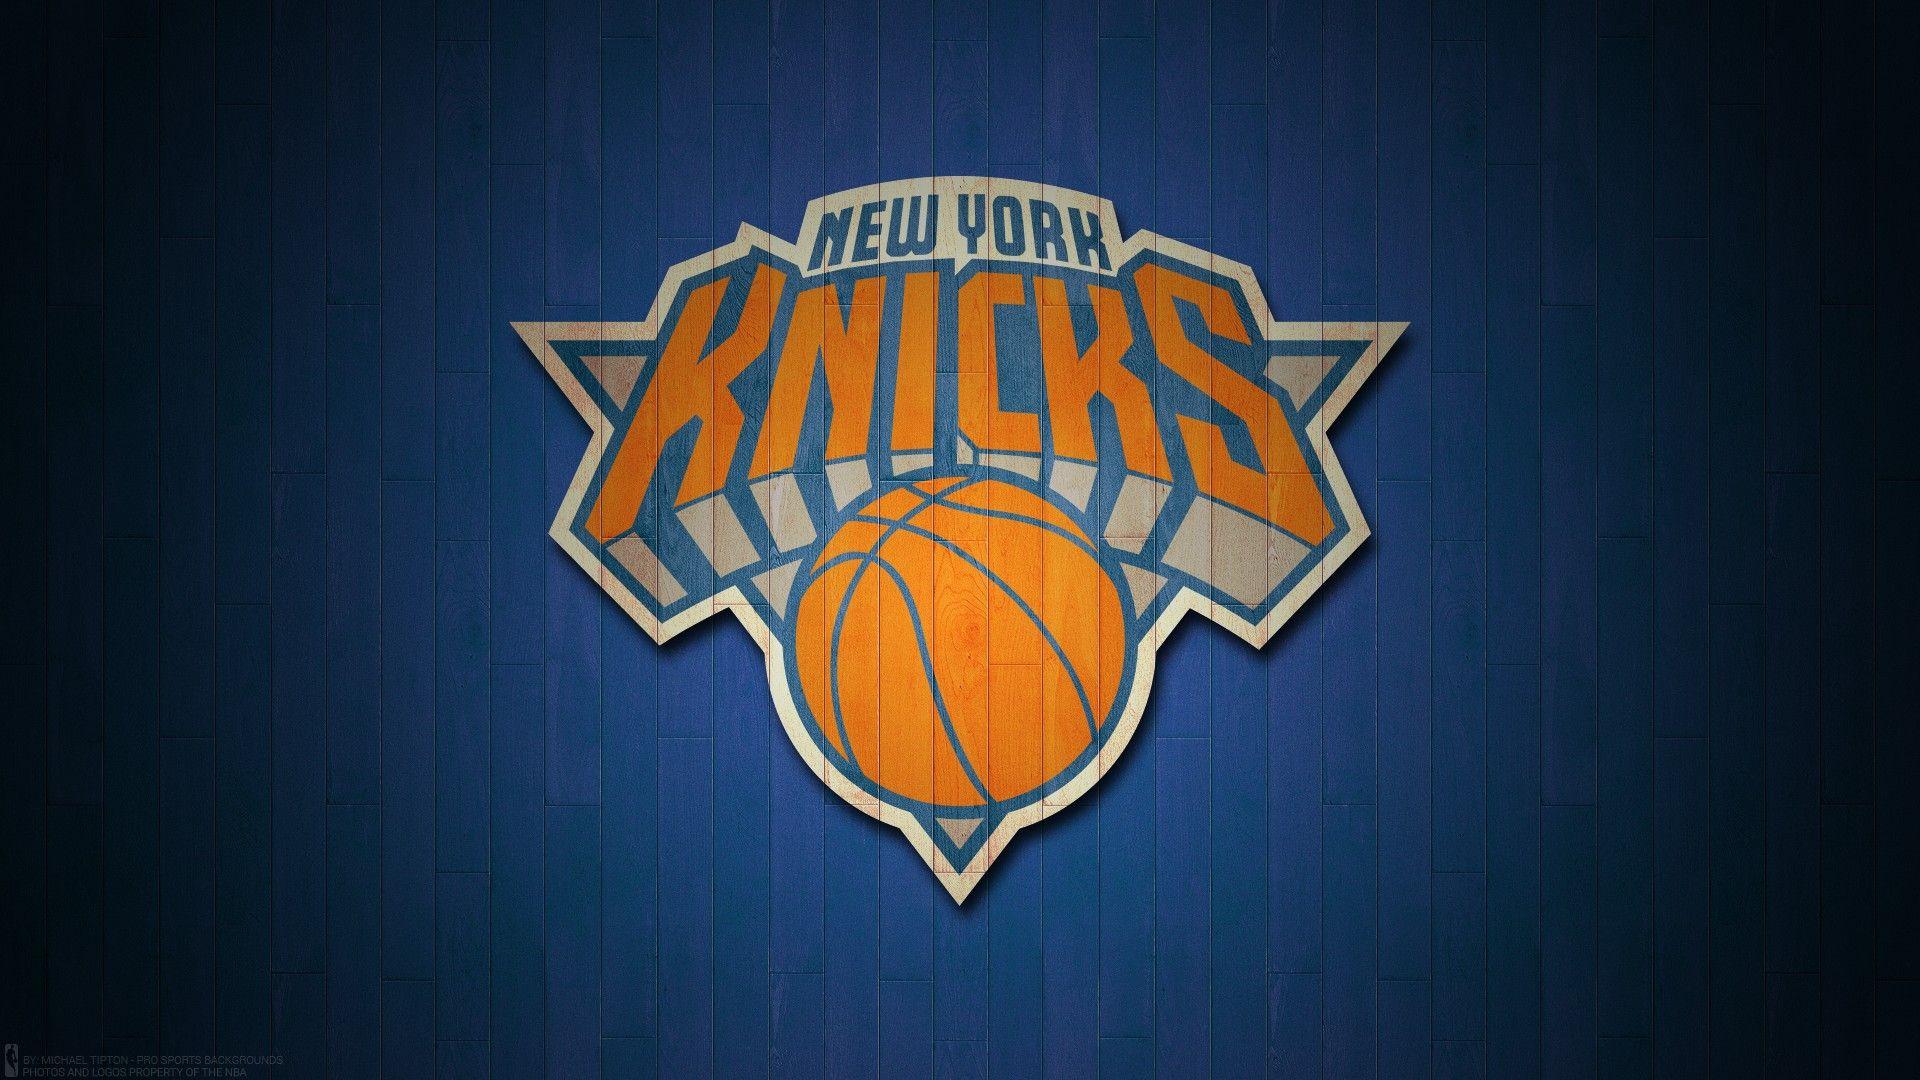 Ny Knicks Wallpaper Hd Nba Wallpapers New York Knicks New York Knicks Logo